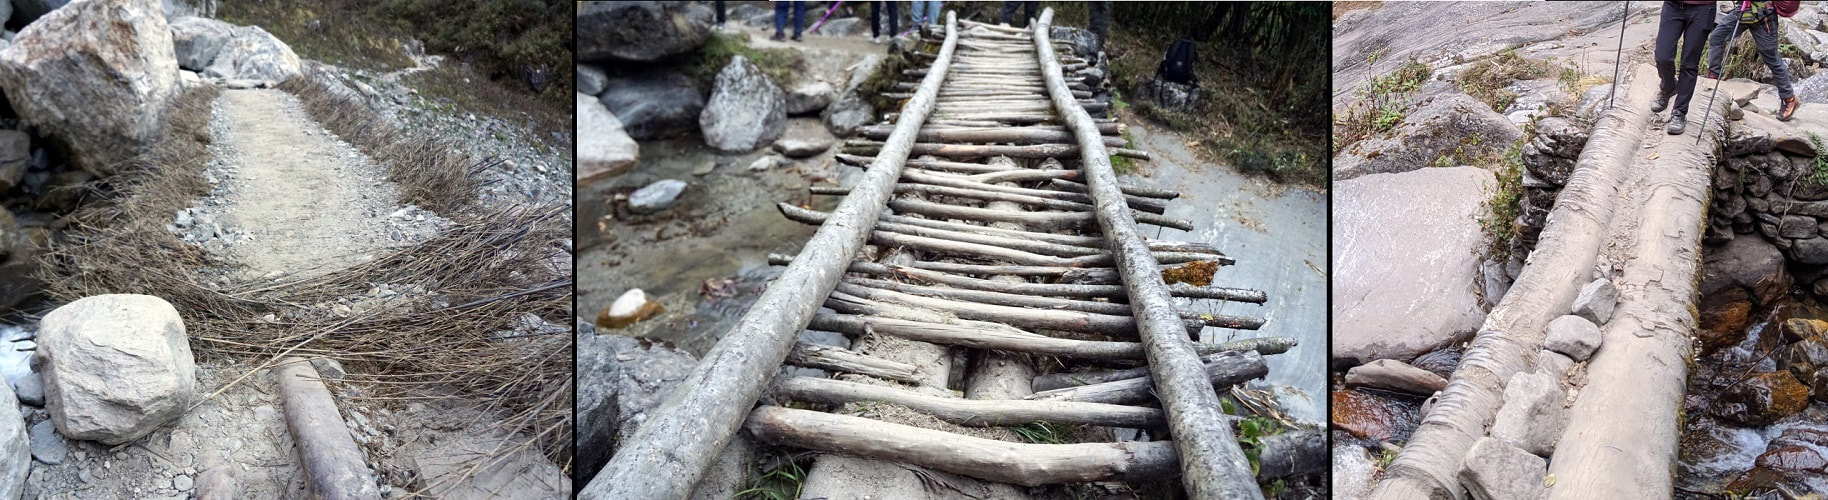 Wood Bridges on the Annapurna Base Camp Trek